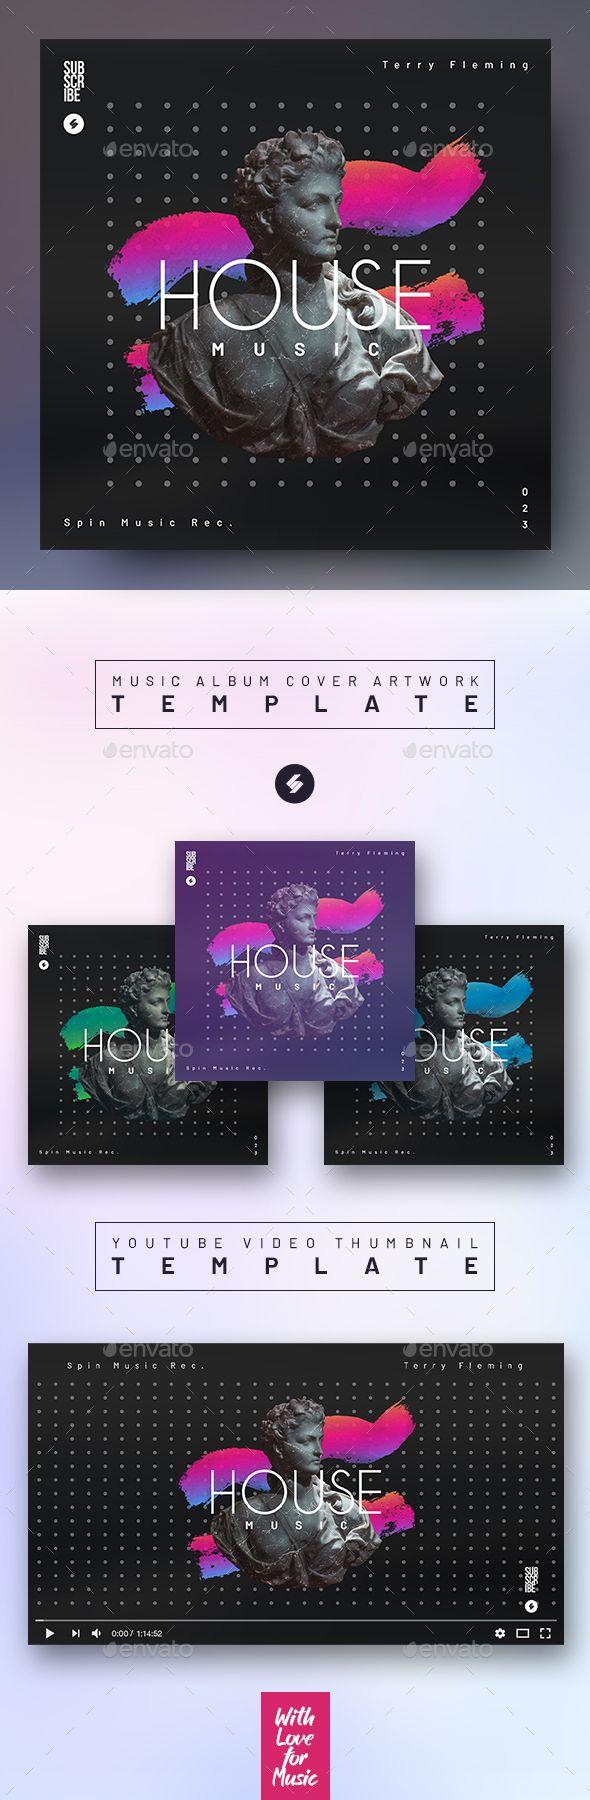 House Music Album Cover Artwork Video Thumbnail Template Music Album Cover Cover Artwork Album Covers